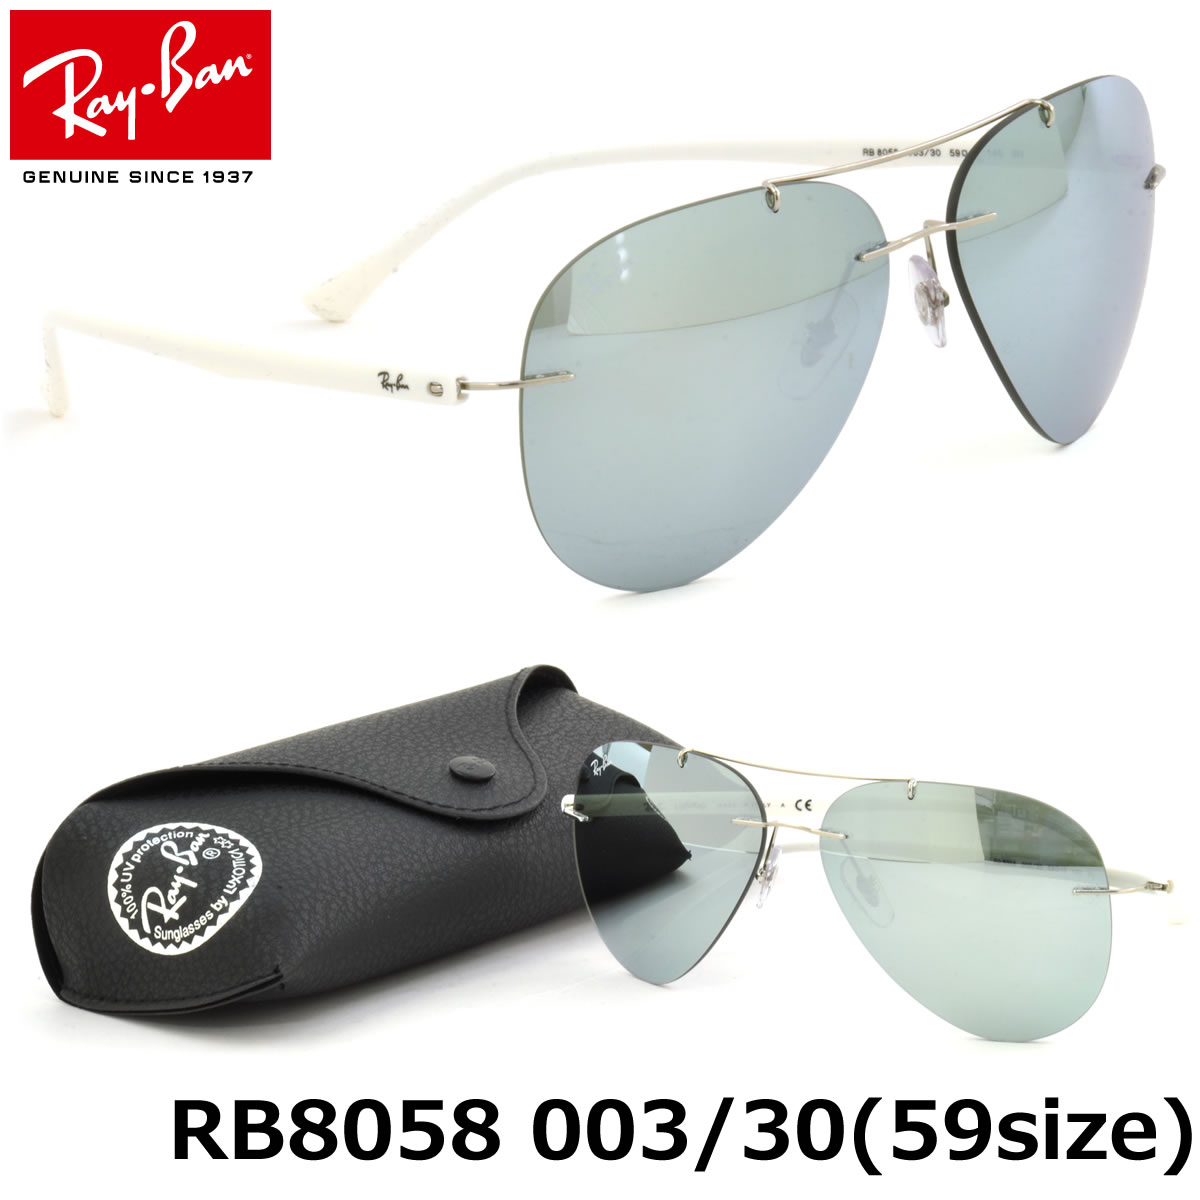 ca37adf6d9 Optical Shop Thats  (Ray-Ban) sunglasses RB8058 003 30 59 size TECH ...